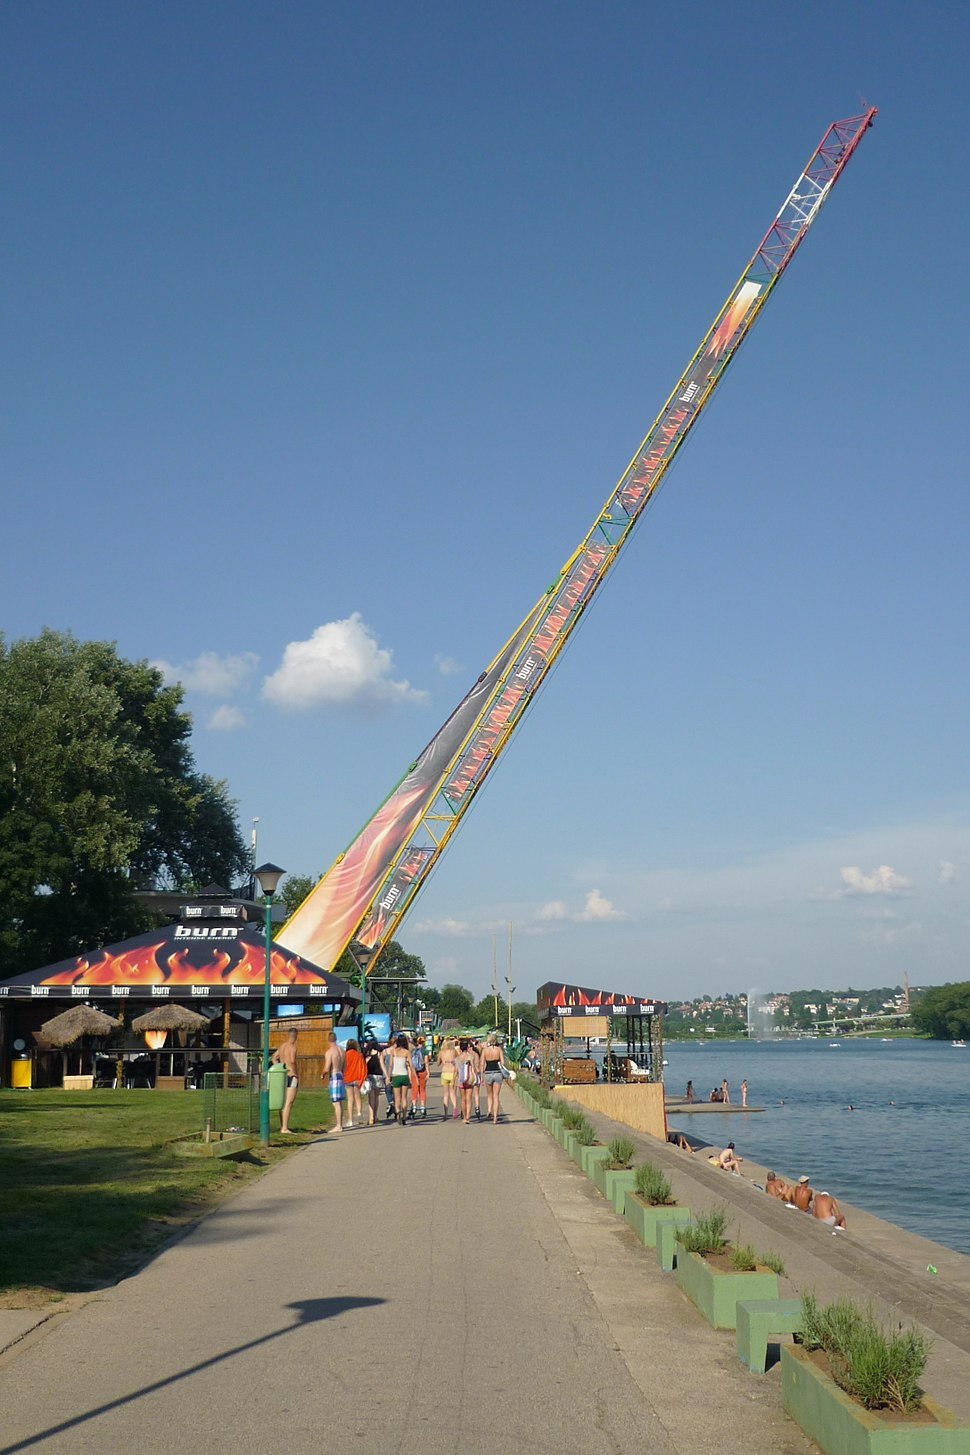 Ada Ciganlija bungee jumping